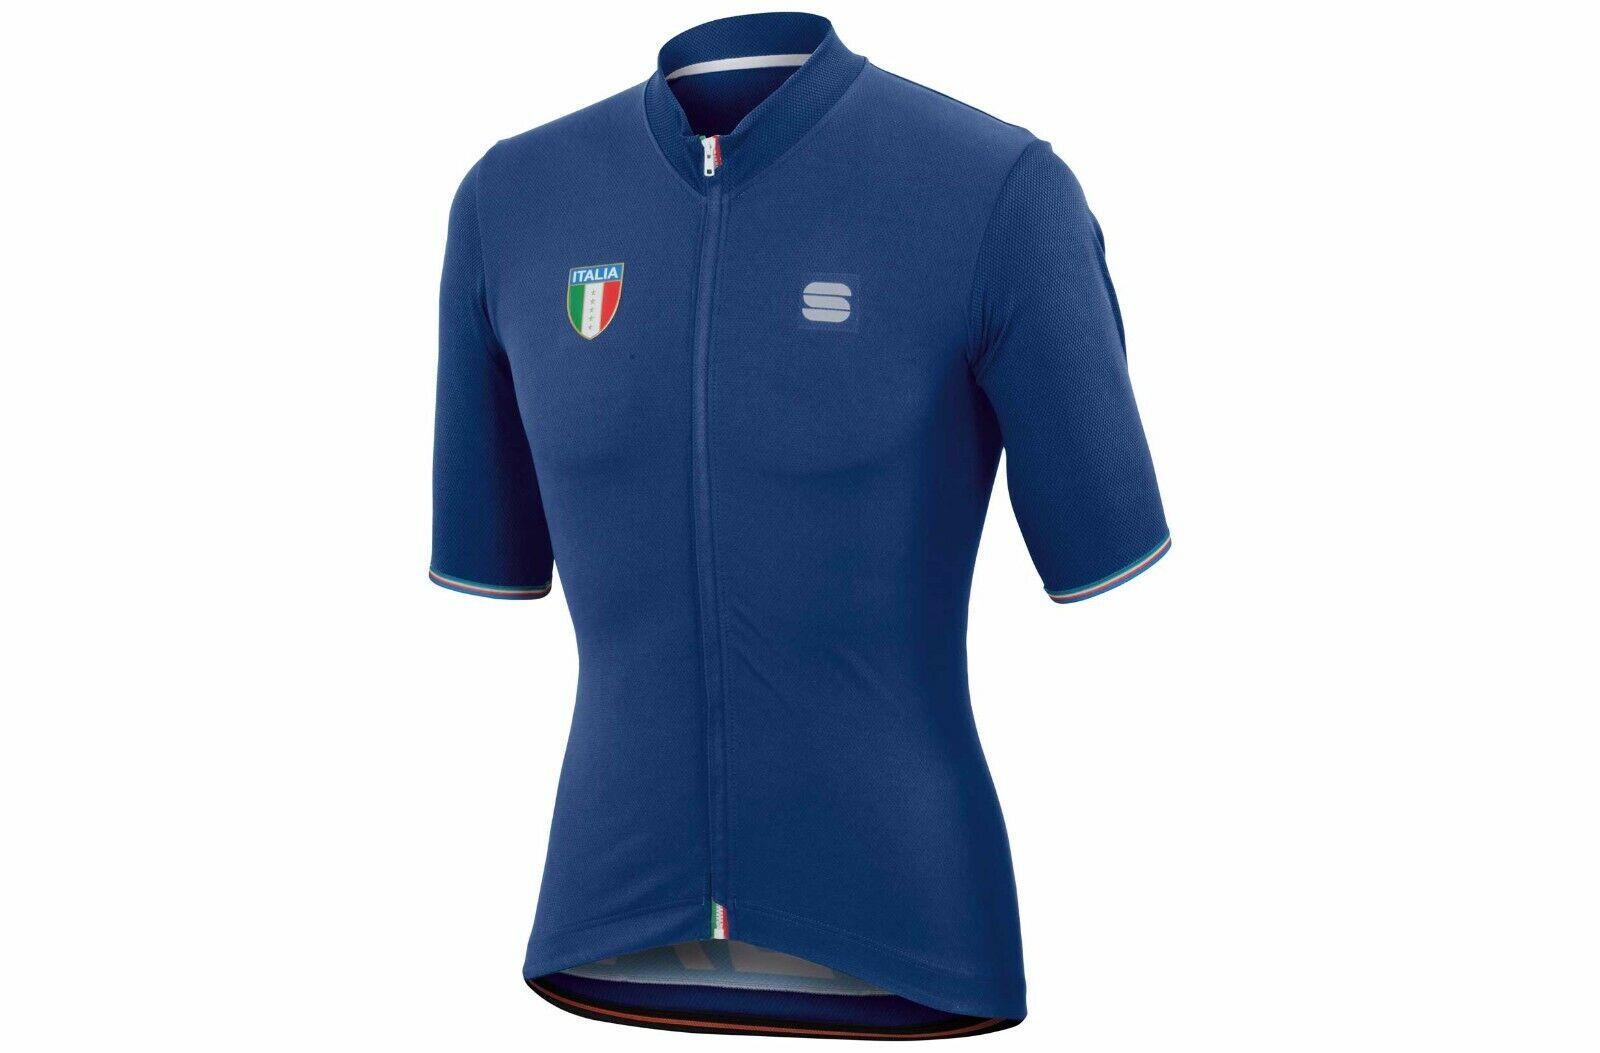 SporBindenve Italia CL Jersey M blauw RRP  (65533;)655533;75.00